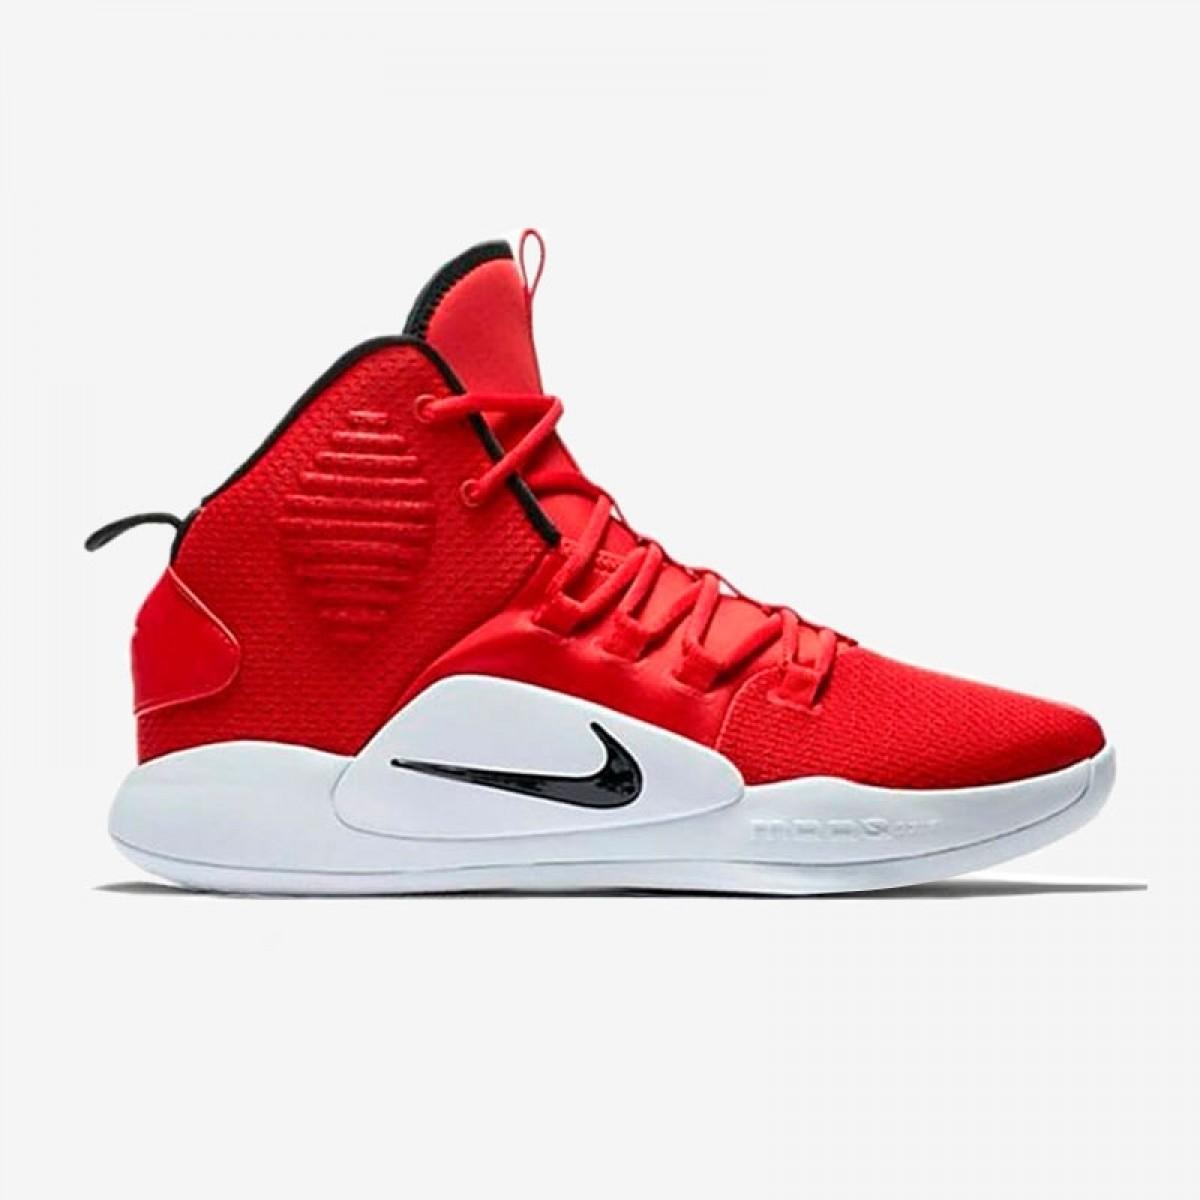 8b31e331c7 Buy Nike Hyperdunk X TB 2018 'Red' Basketball shoes & sneakers